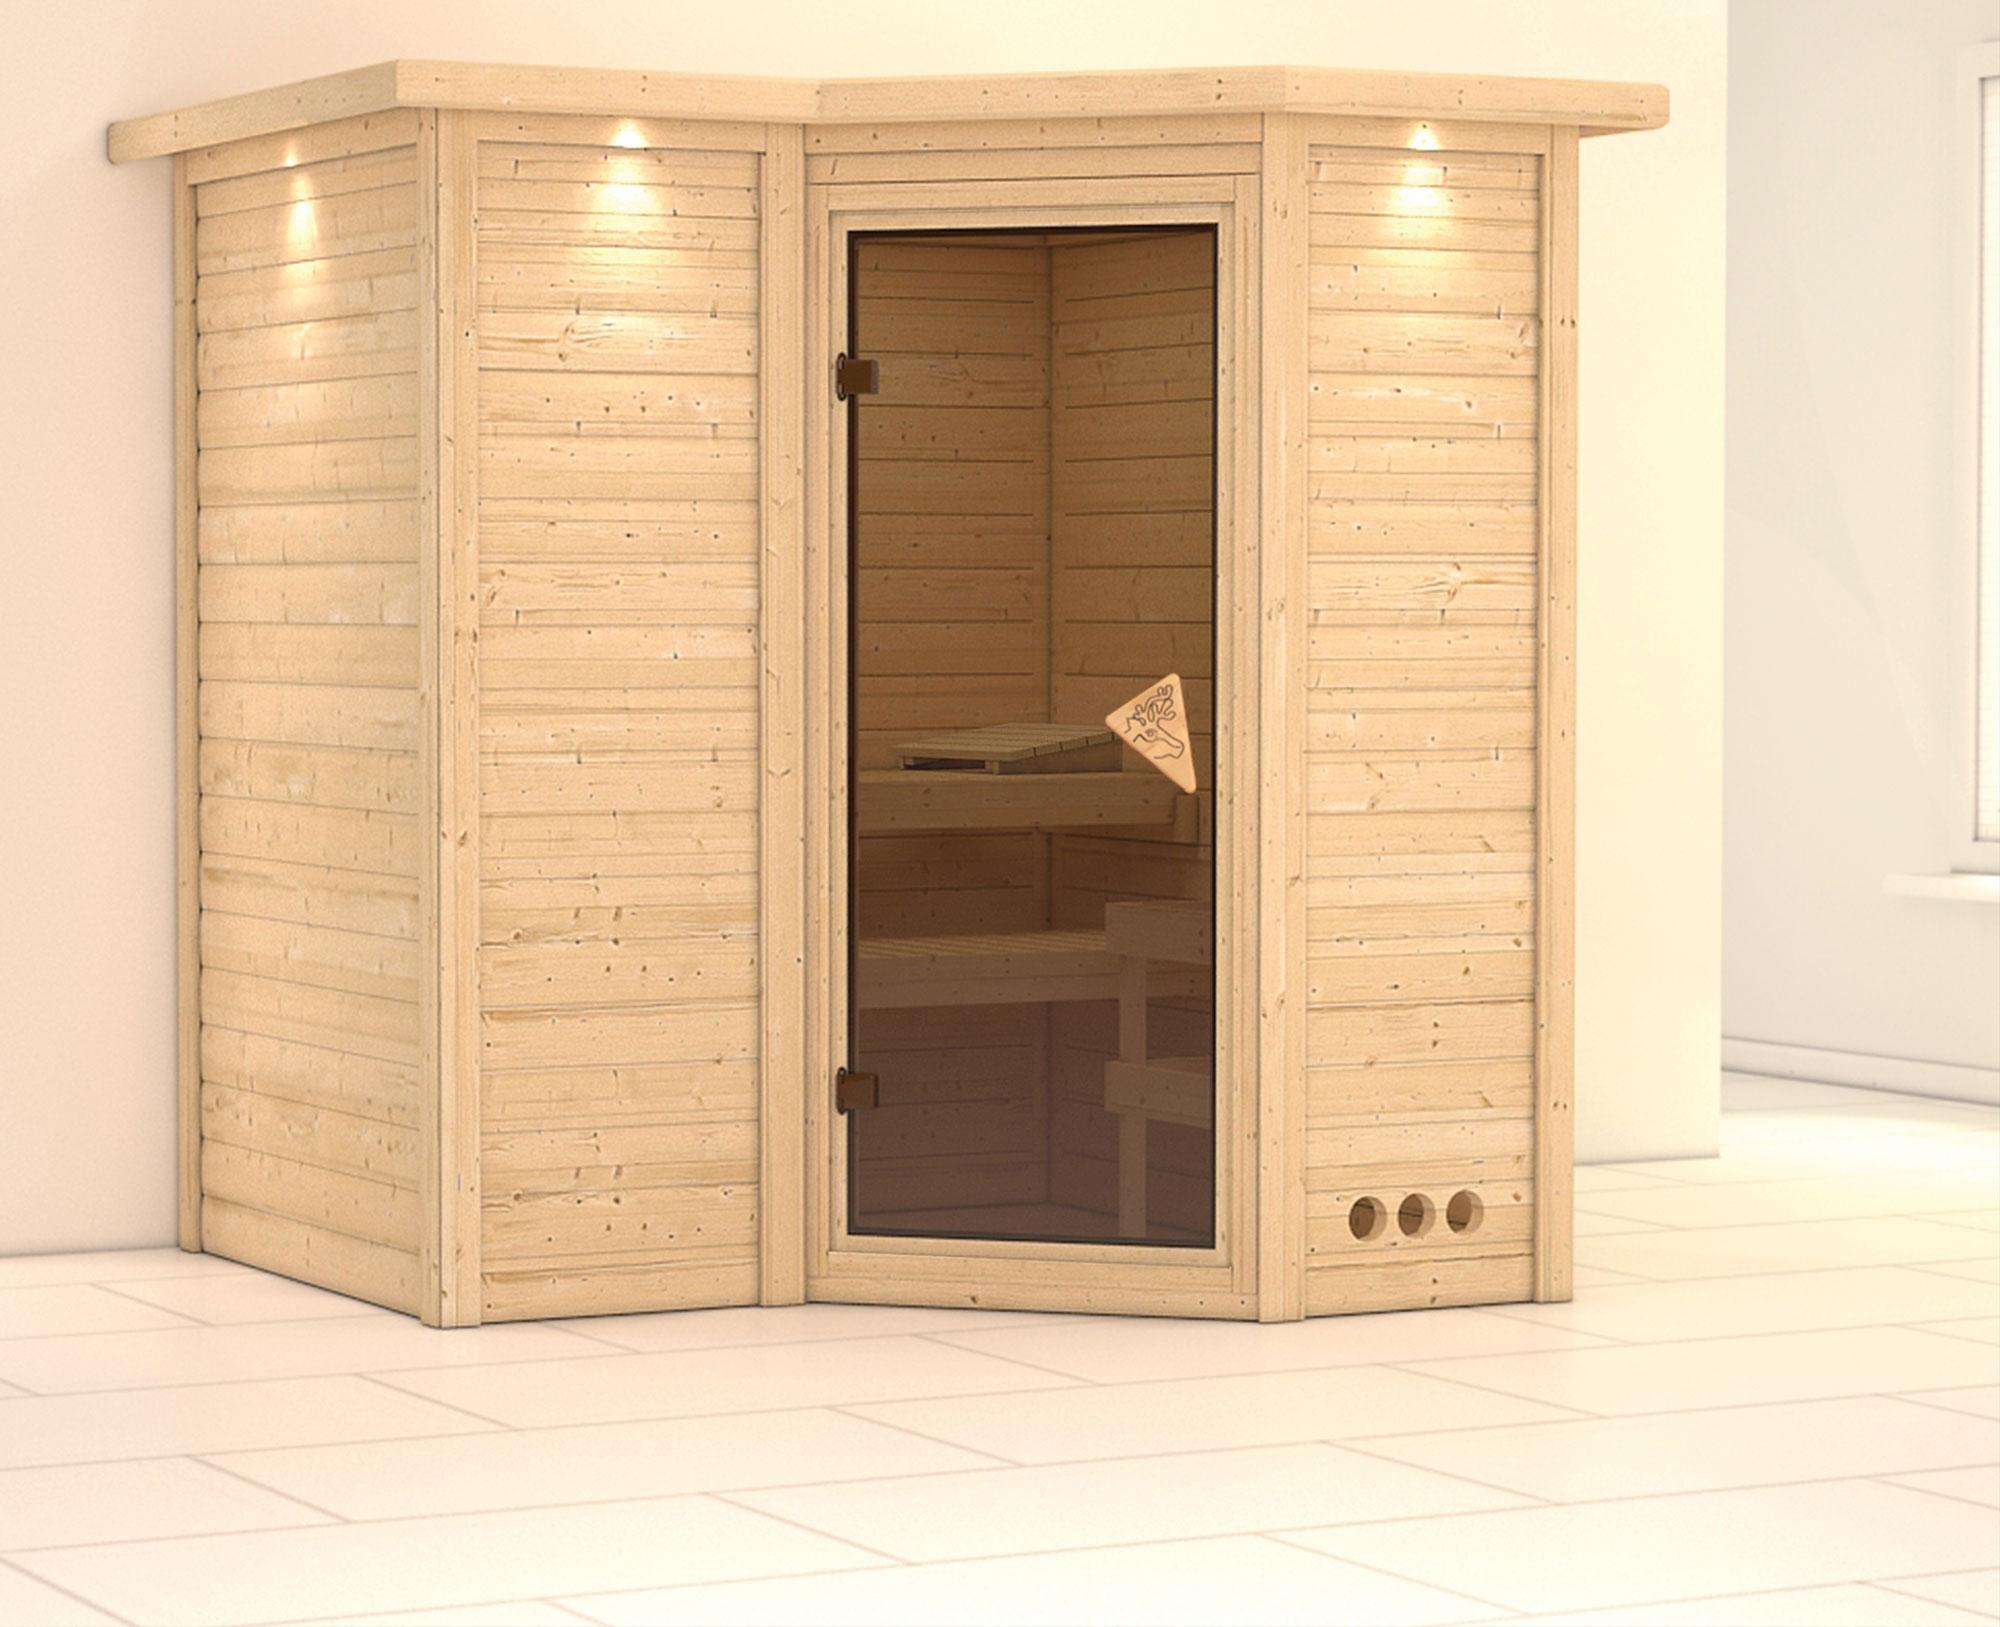 karibu sauna sahib 1 massivholz 40mm mit dachkranz ohne. Black Bedroom Furniture Sets. Home Design Ideas